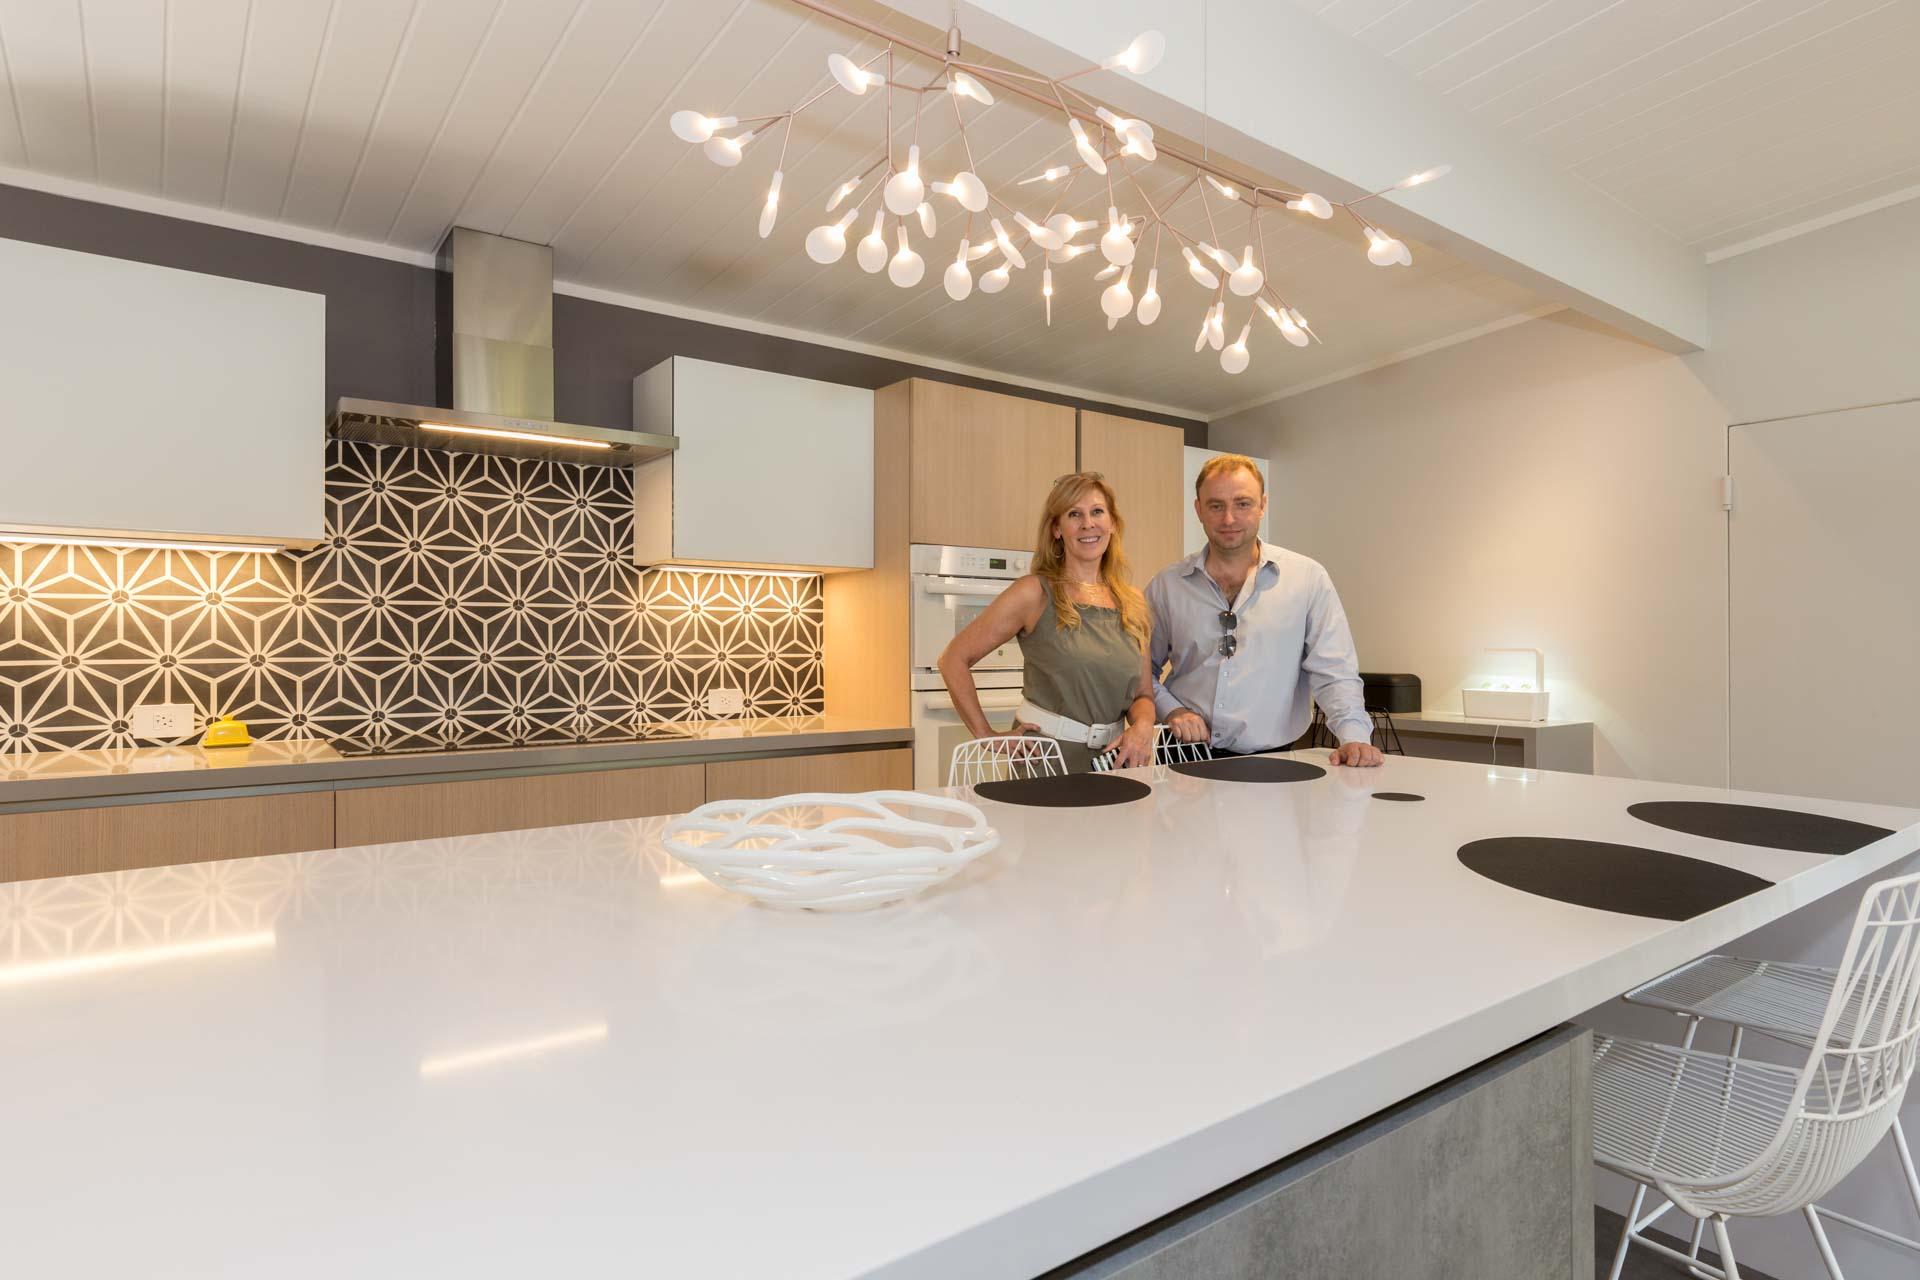 An Interior Designer On Remodeling Her Own Kitchen